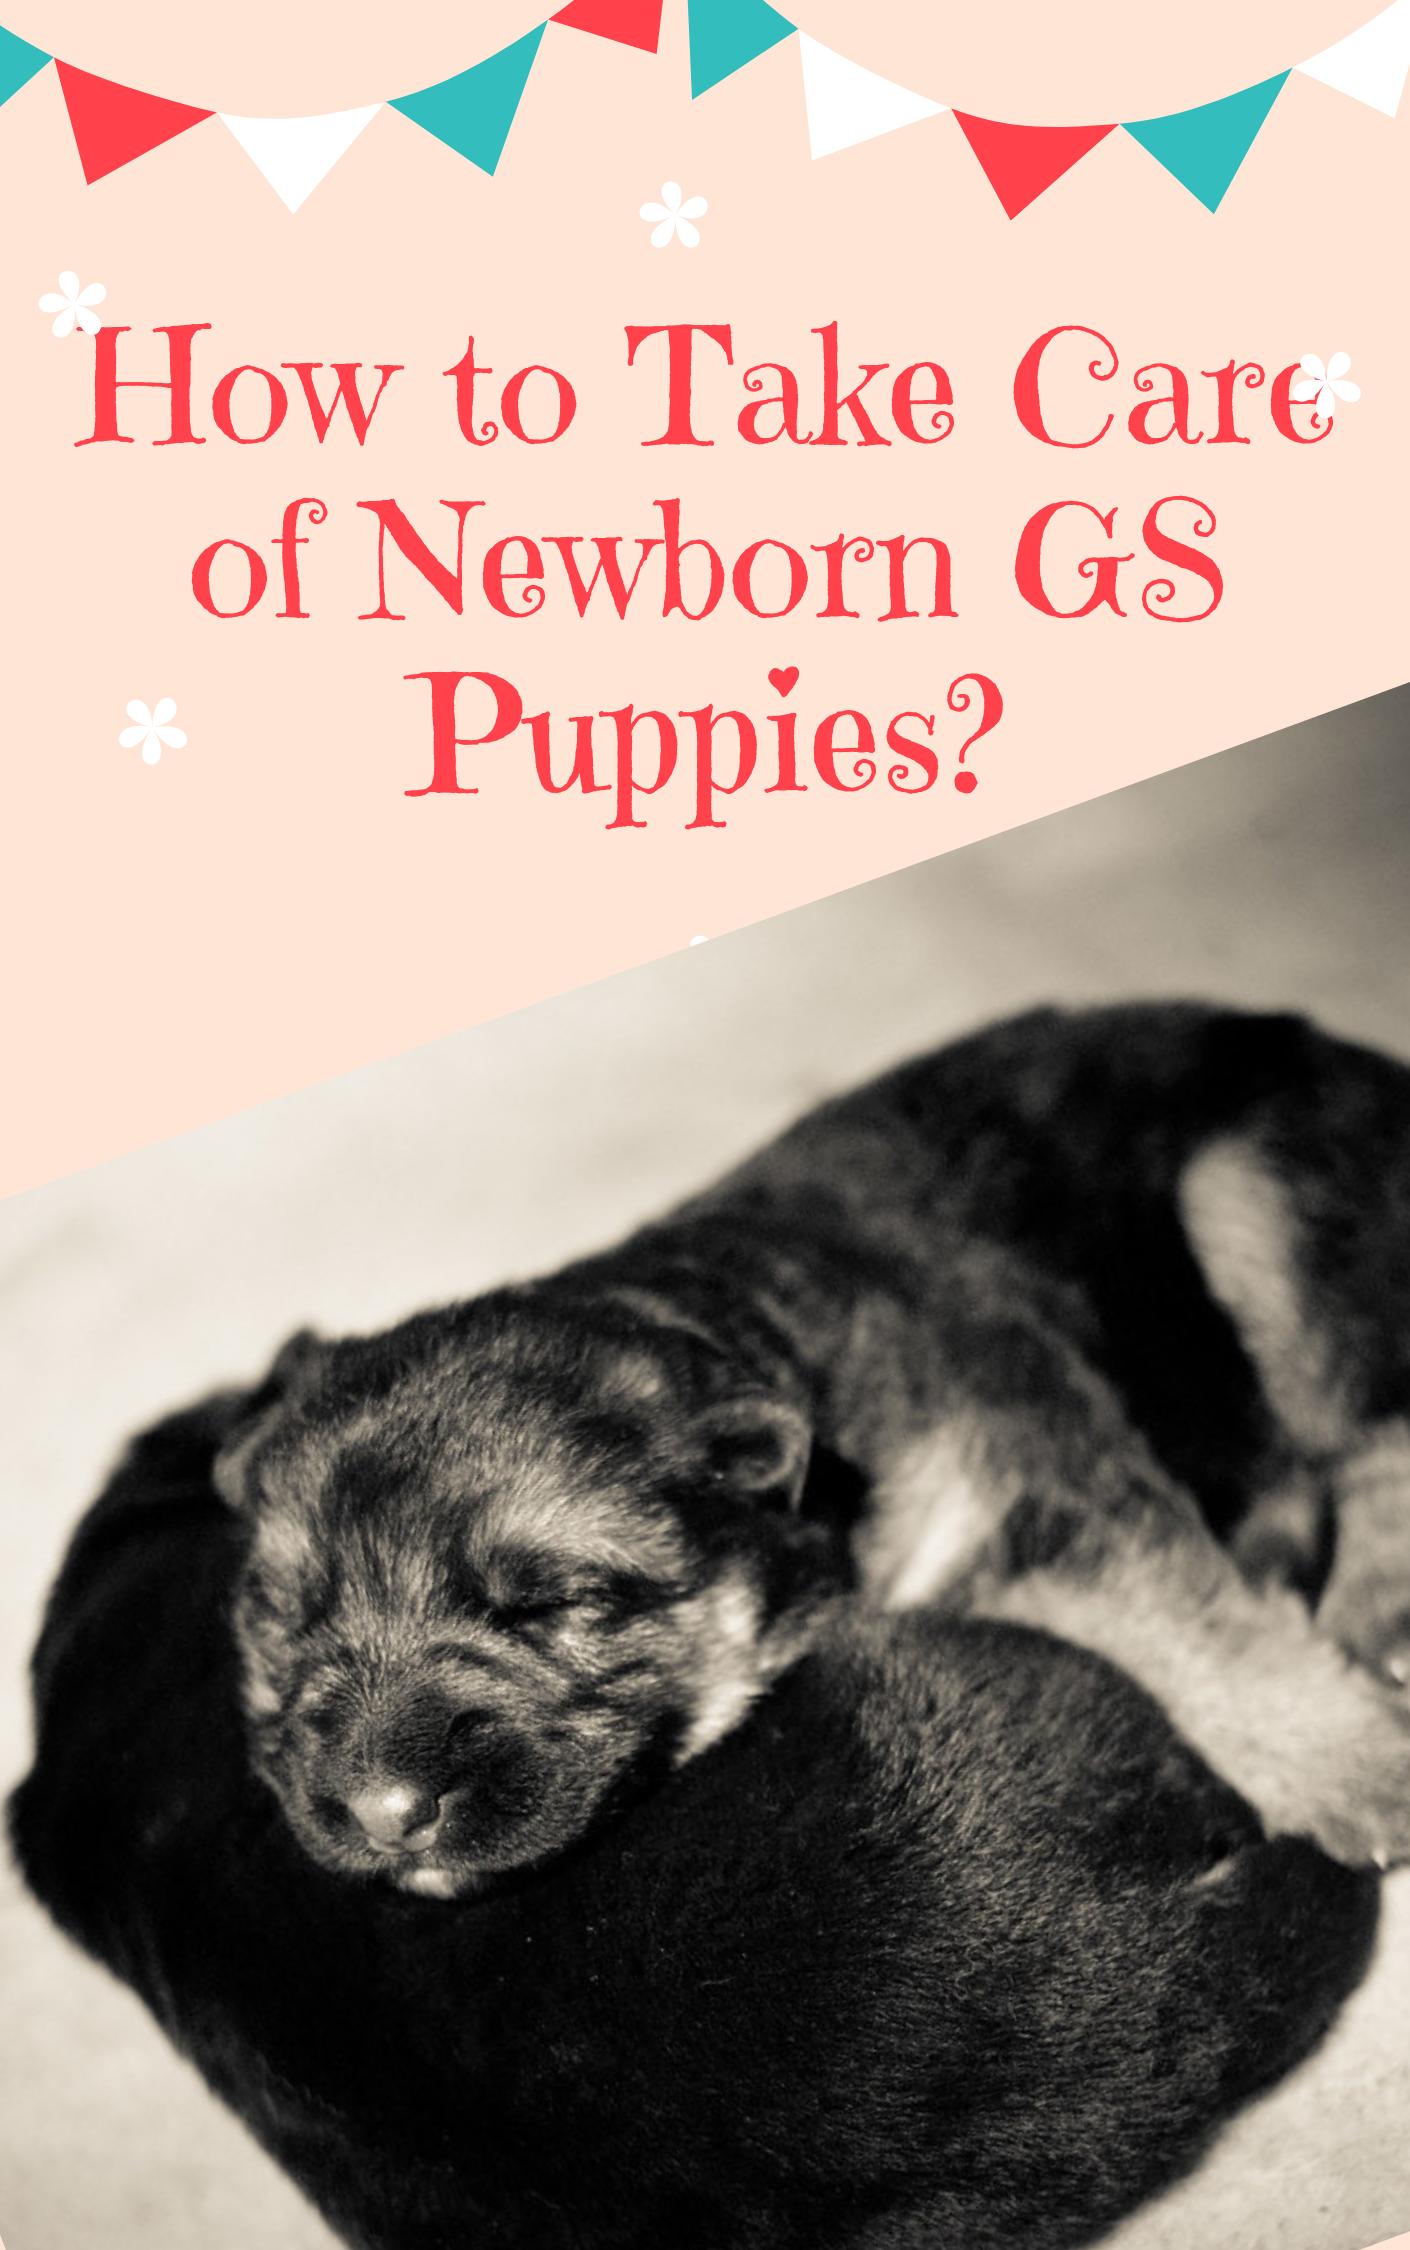 How To Take Care Of Newborn German Shepherd Puppies Shepherd Puppies German Shepherd Puppies Newborn Puppies